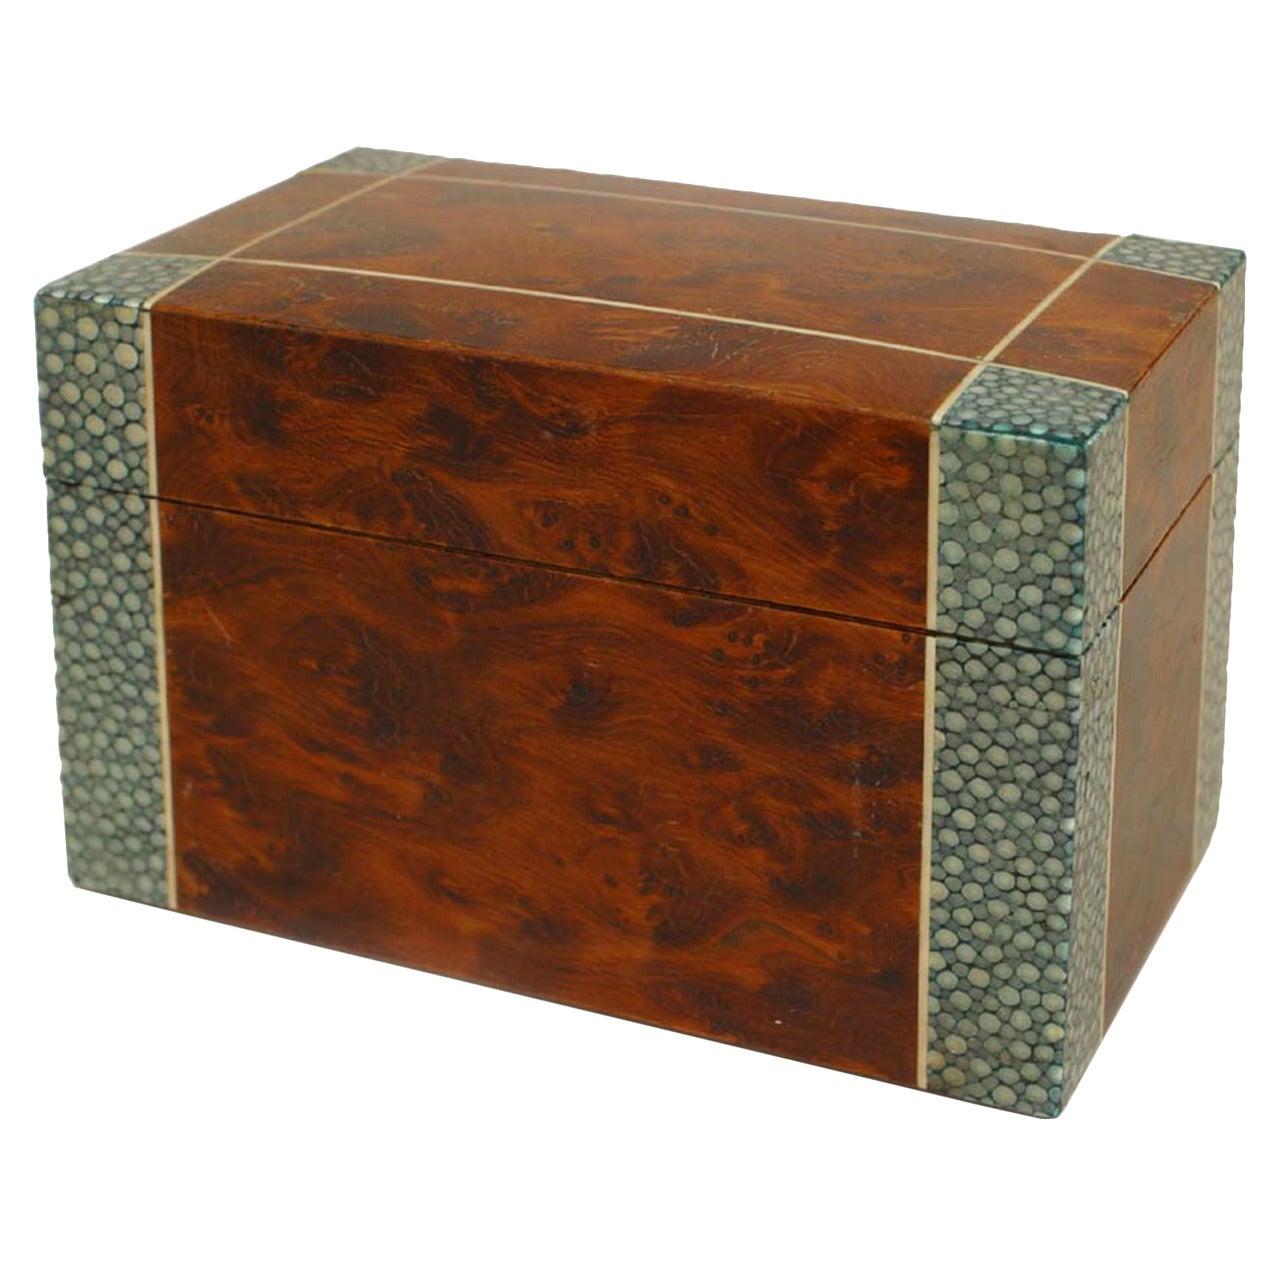 English Art Deco Burl Wood and Shagreen Box